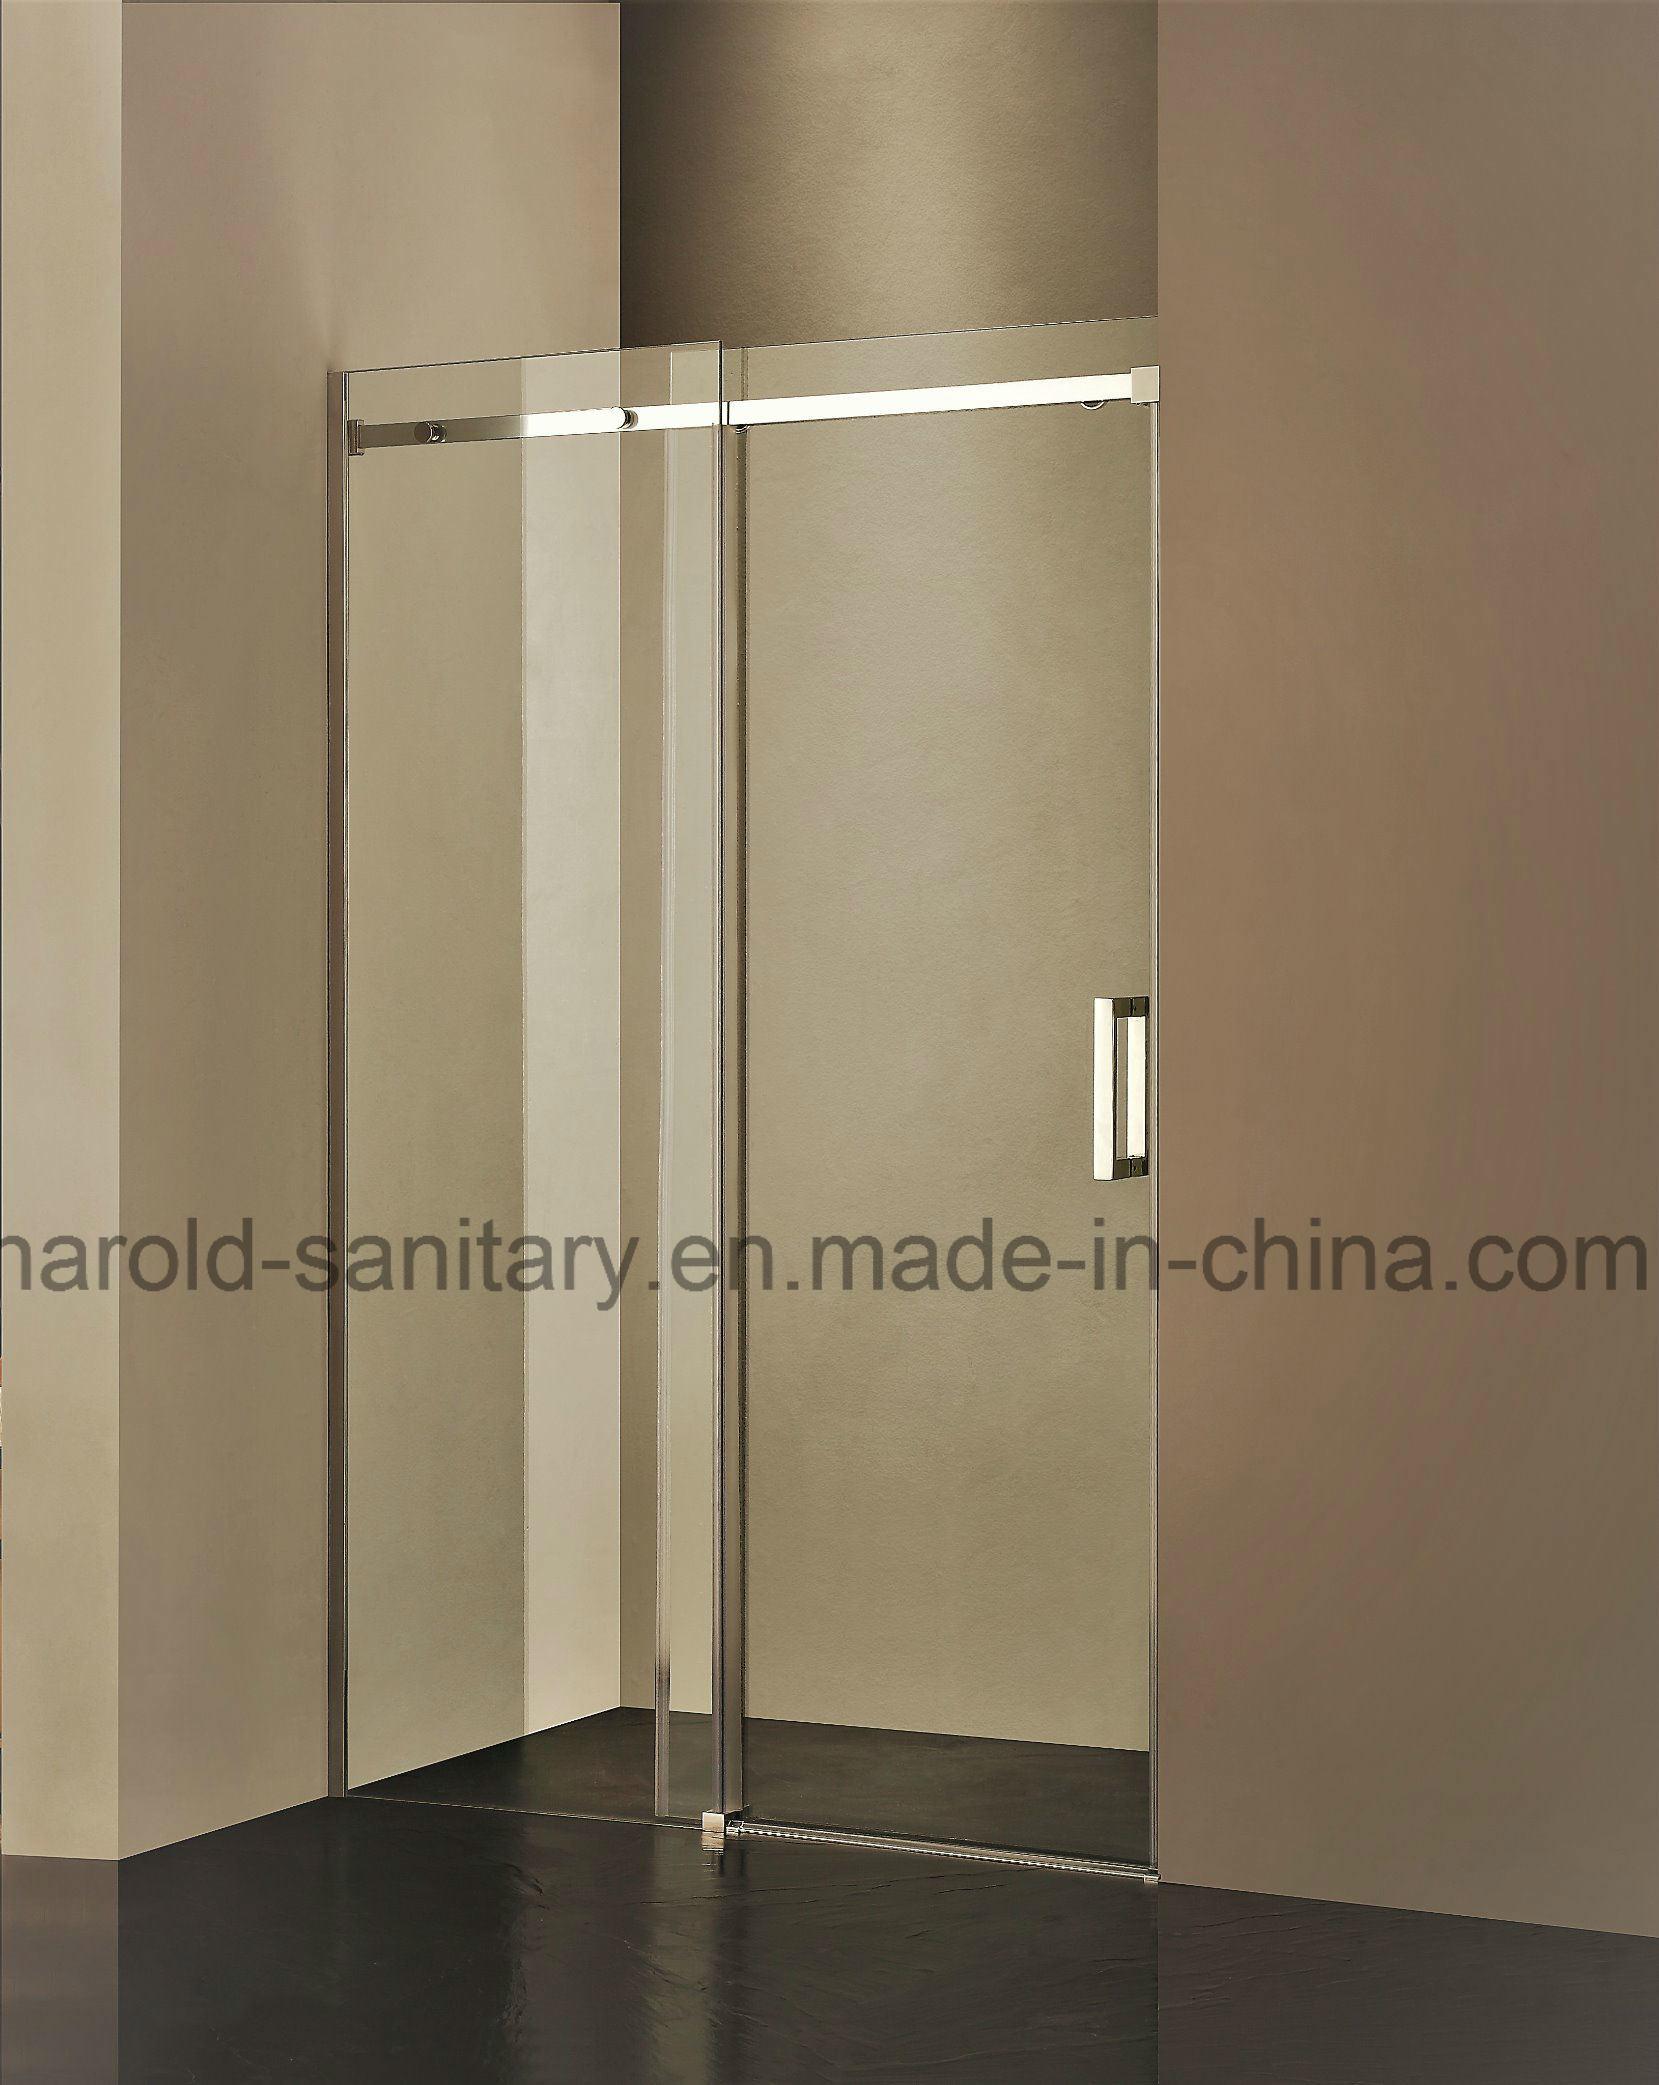 Hr-04-D Straight Single Sliding Shower Door